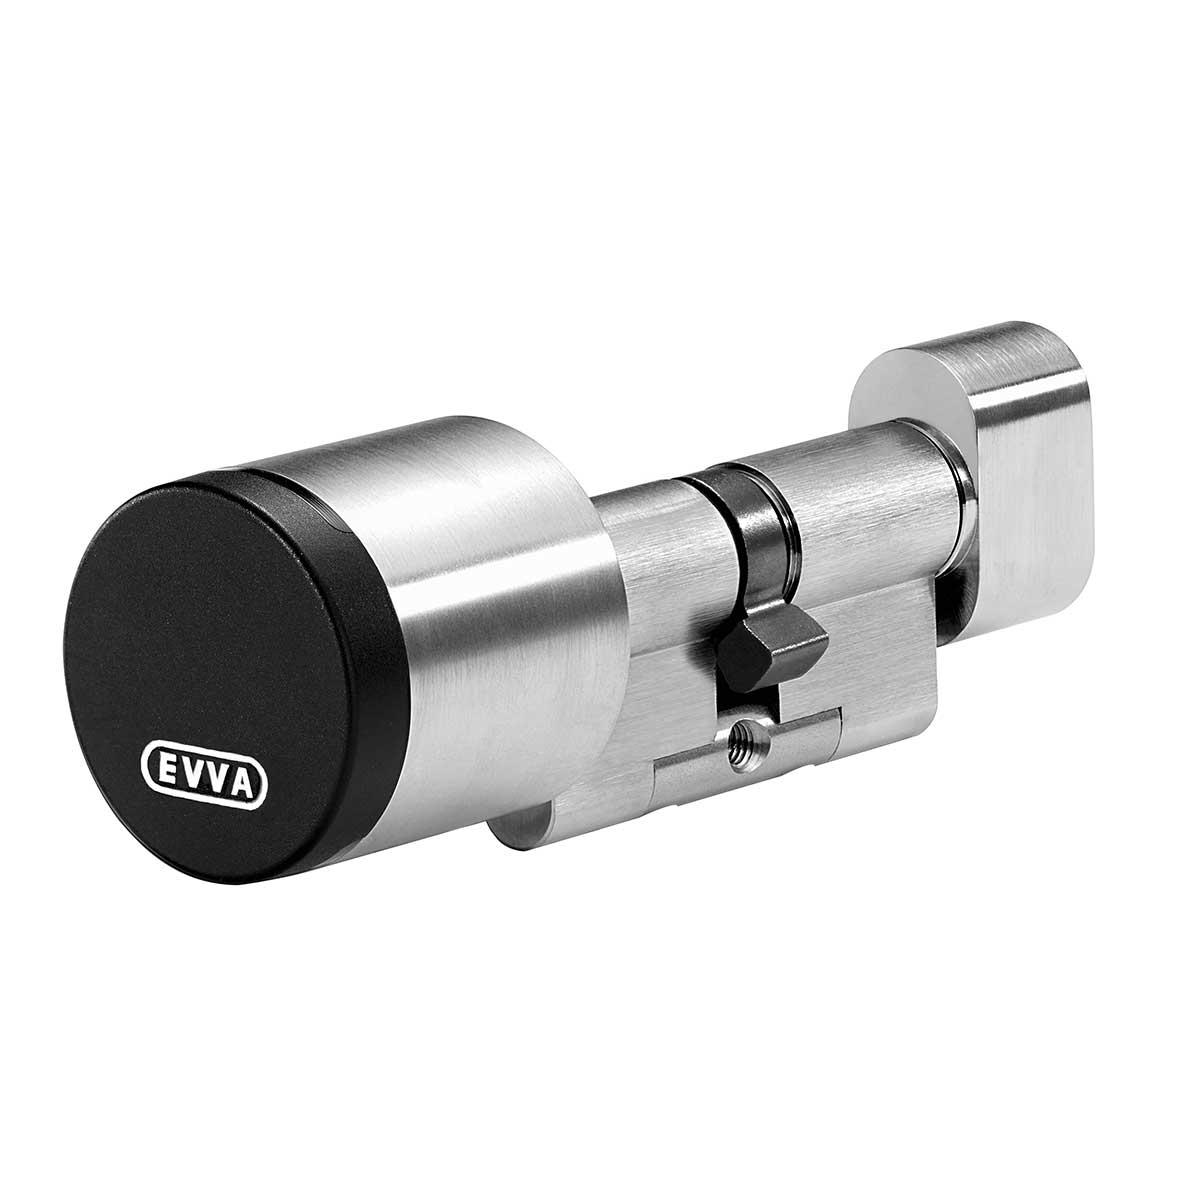 elektrische cilinder slot evva